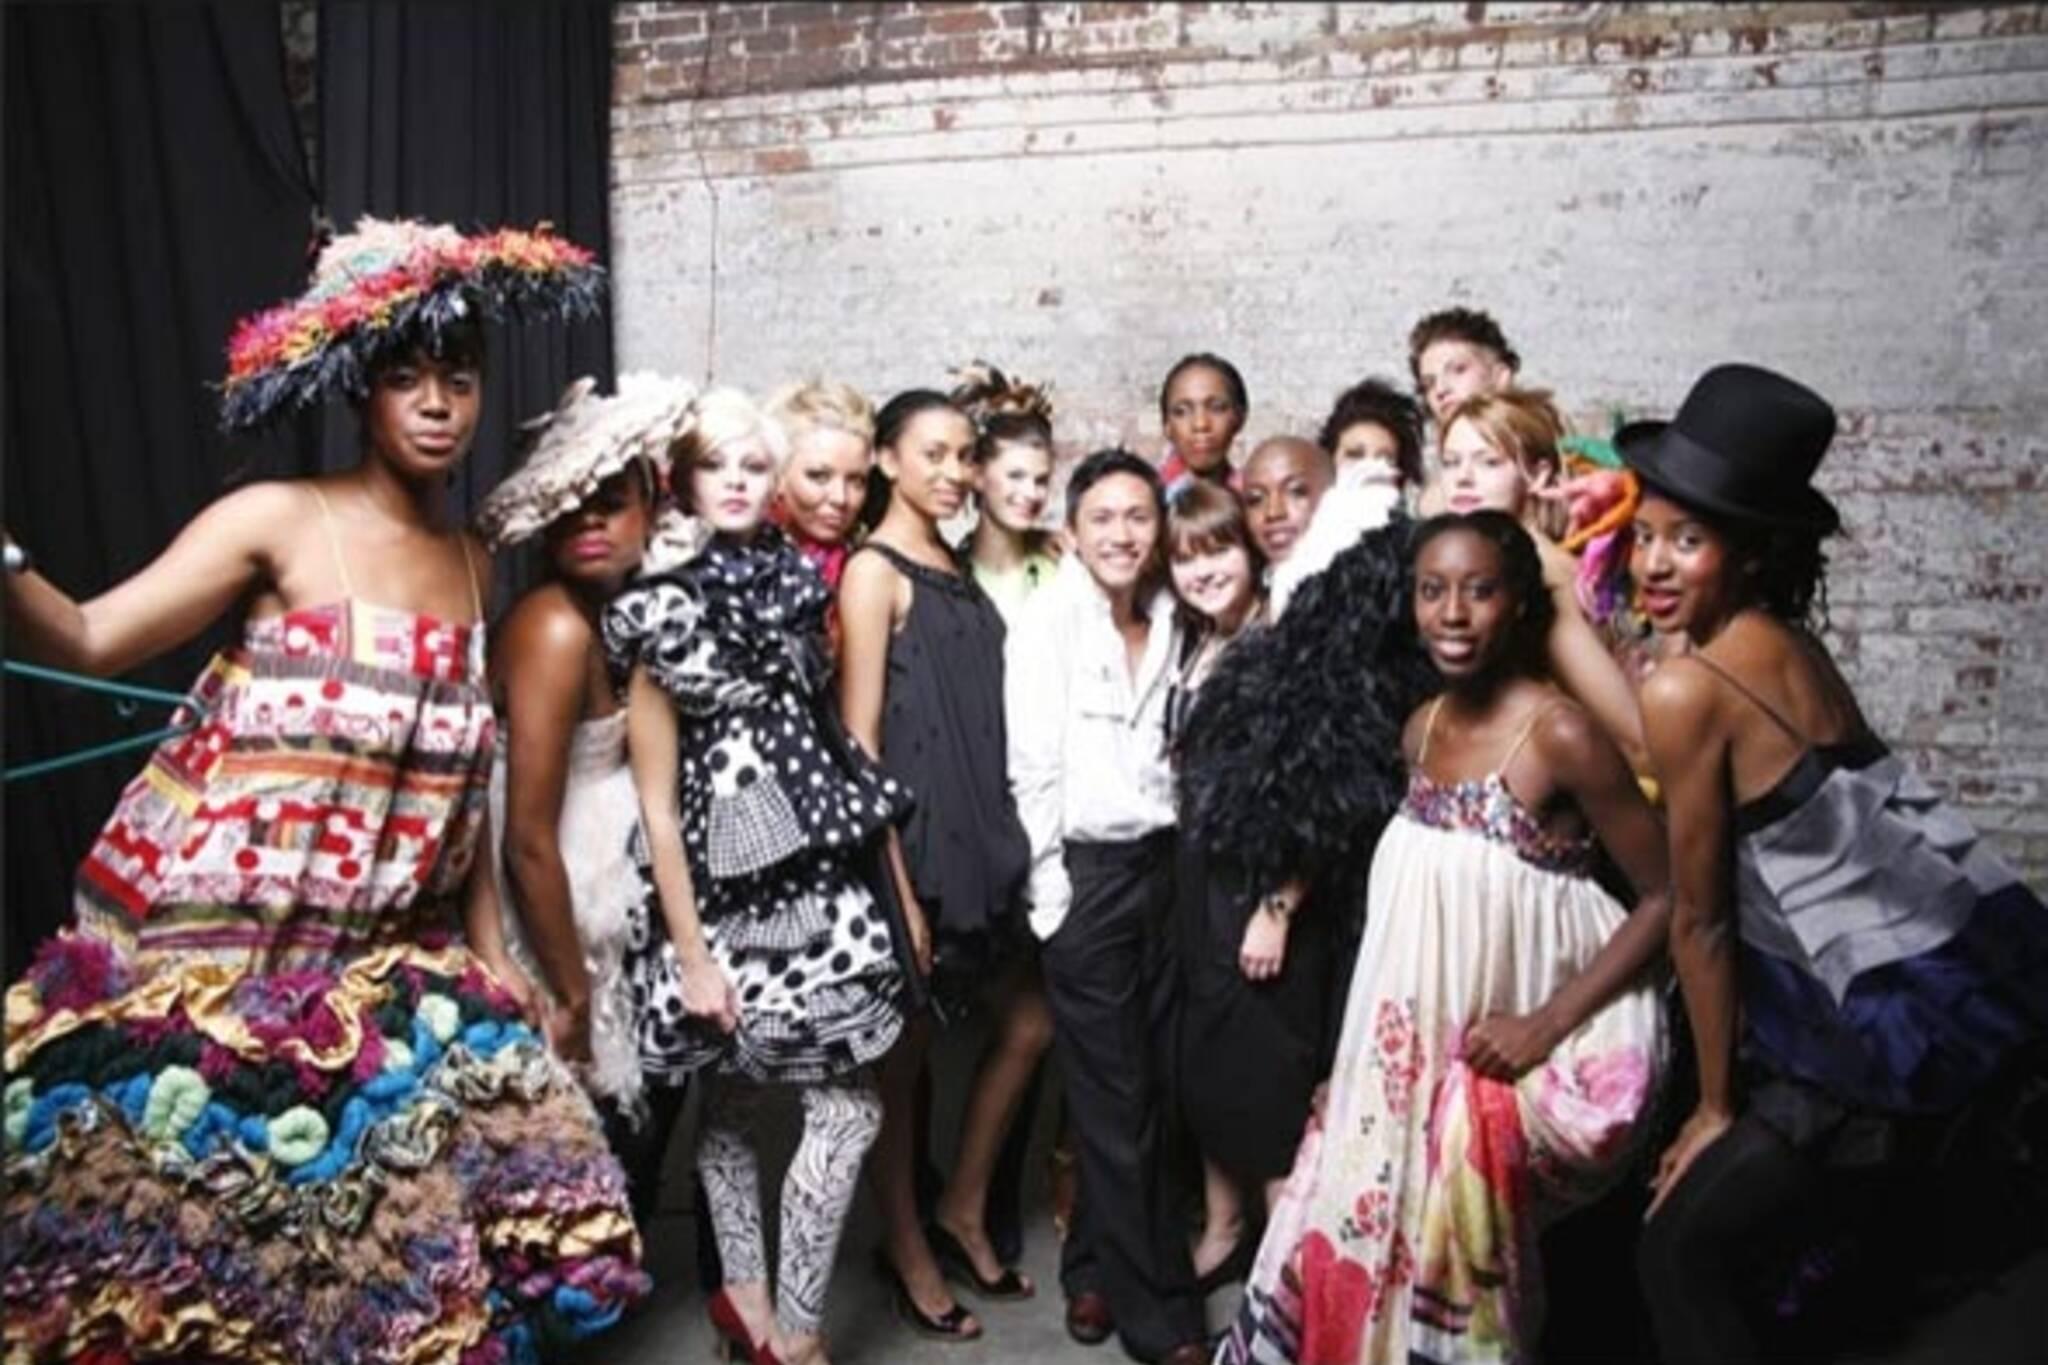 Toronto Alternative Fashion week 2007